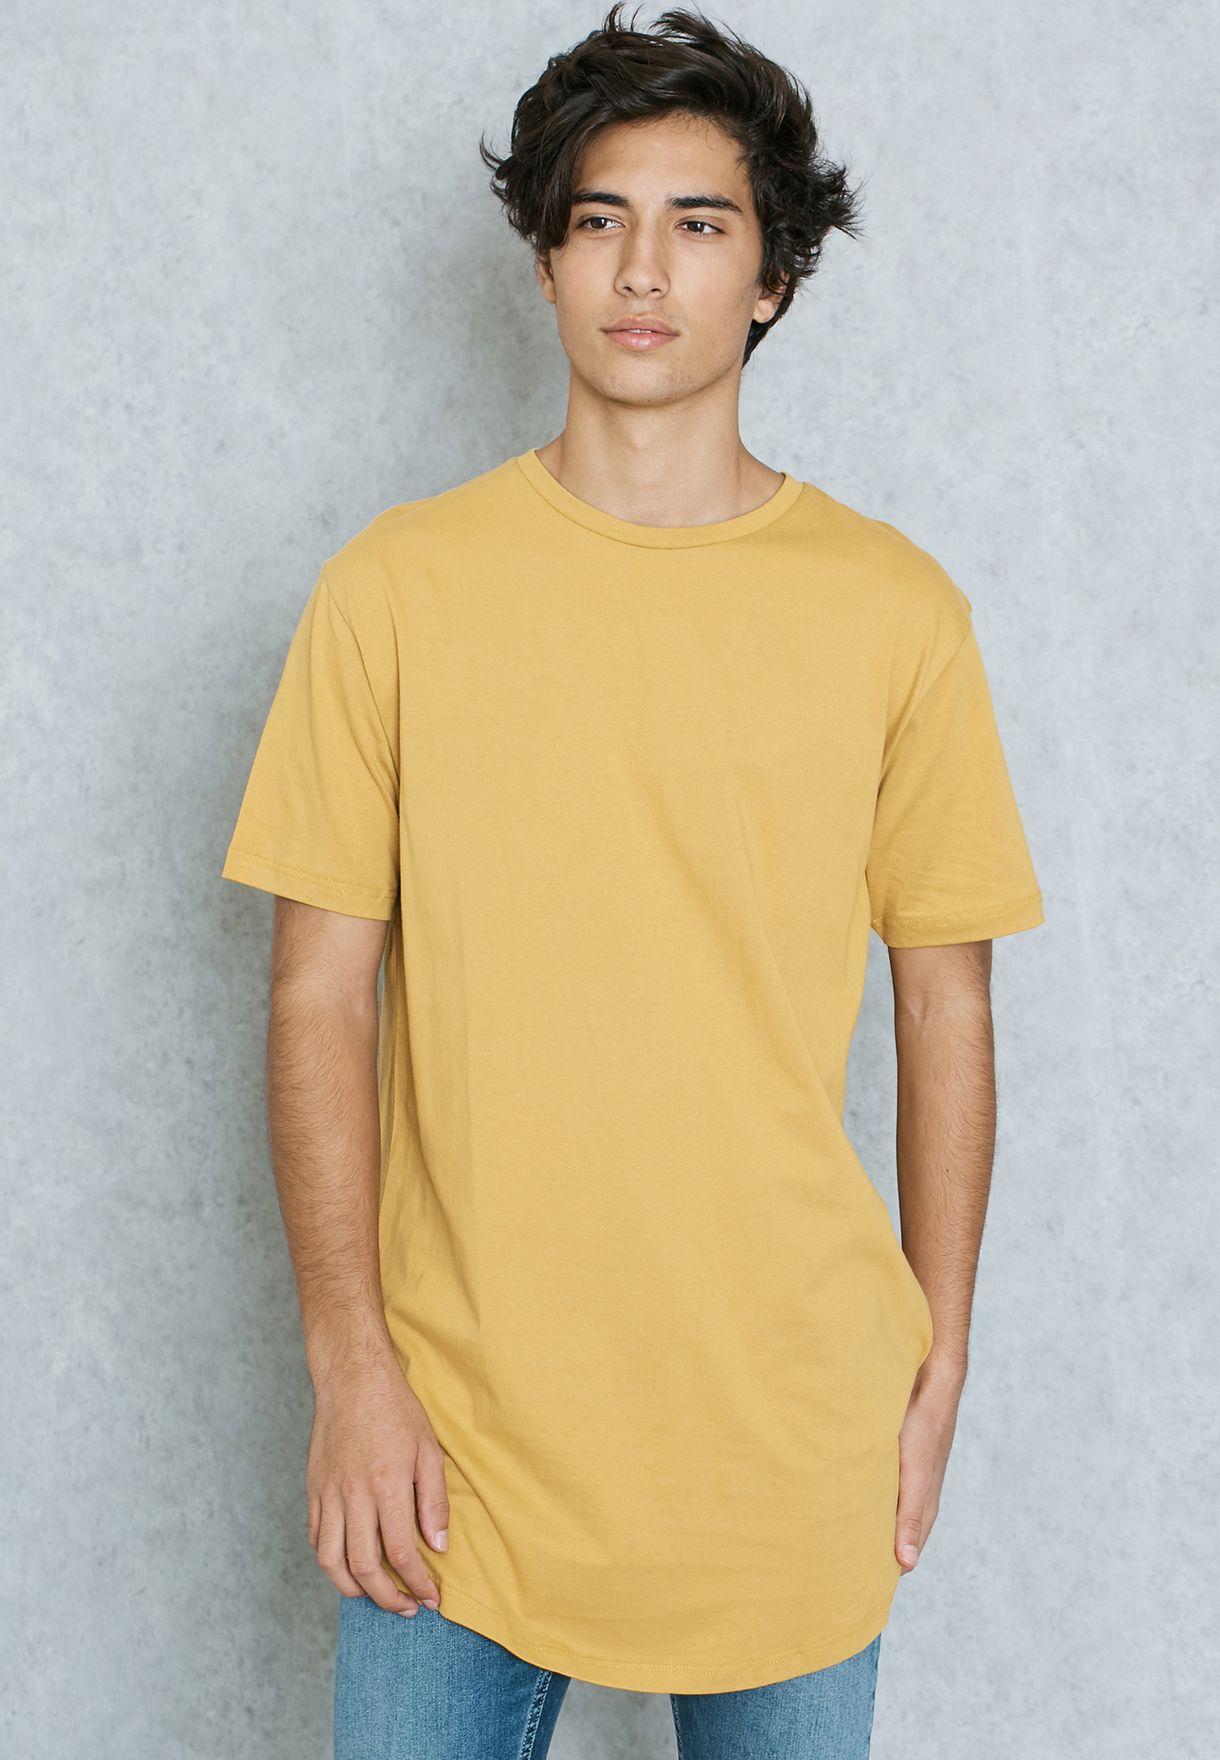 1d59ed58 Shop Topman yellow Yellow Longline T-Shirt 71Q21NYLW for Men in UAE ...